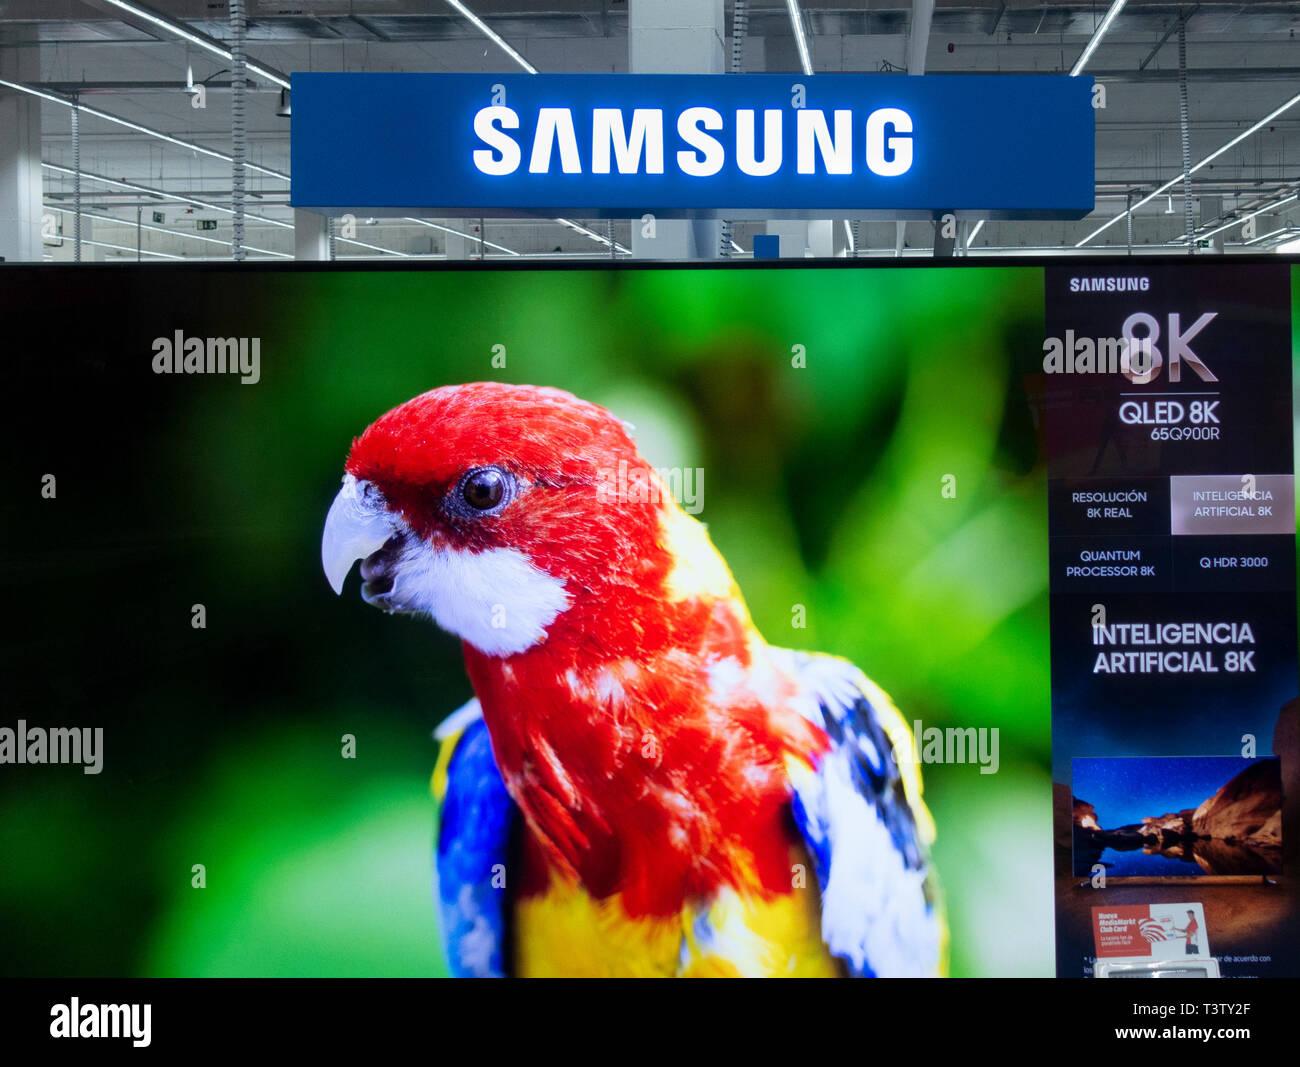 Samsung 8K QLED Television. - Stock Image